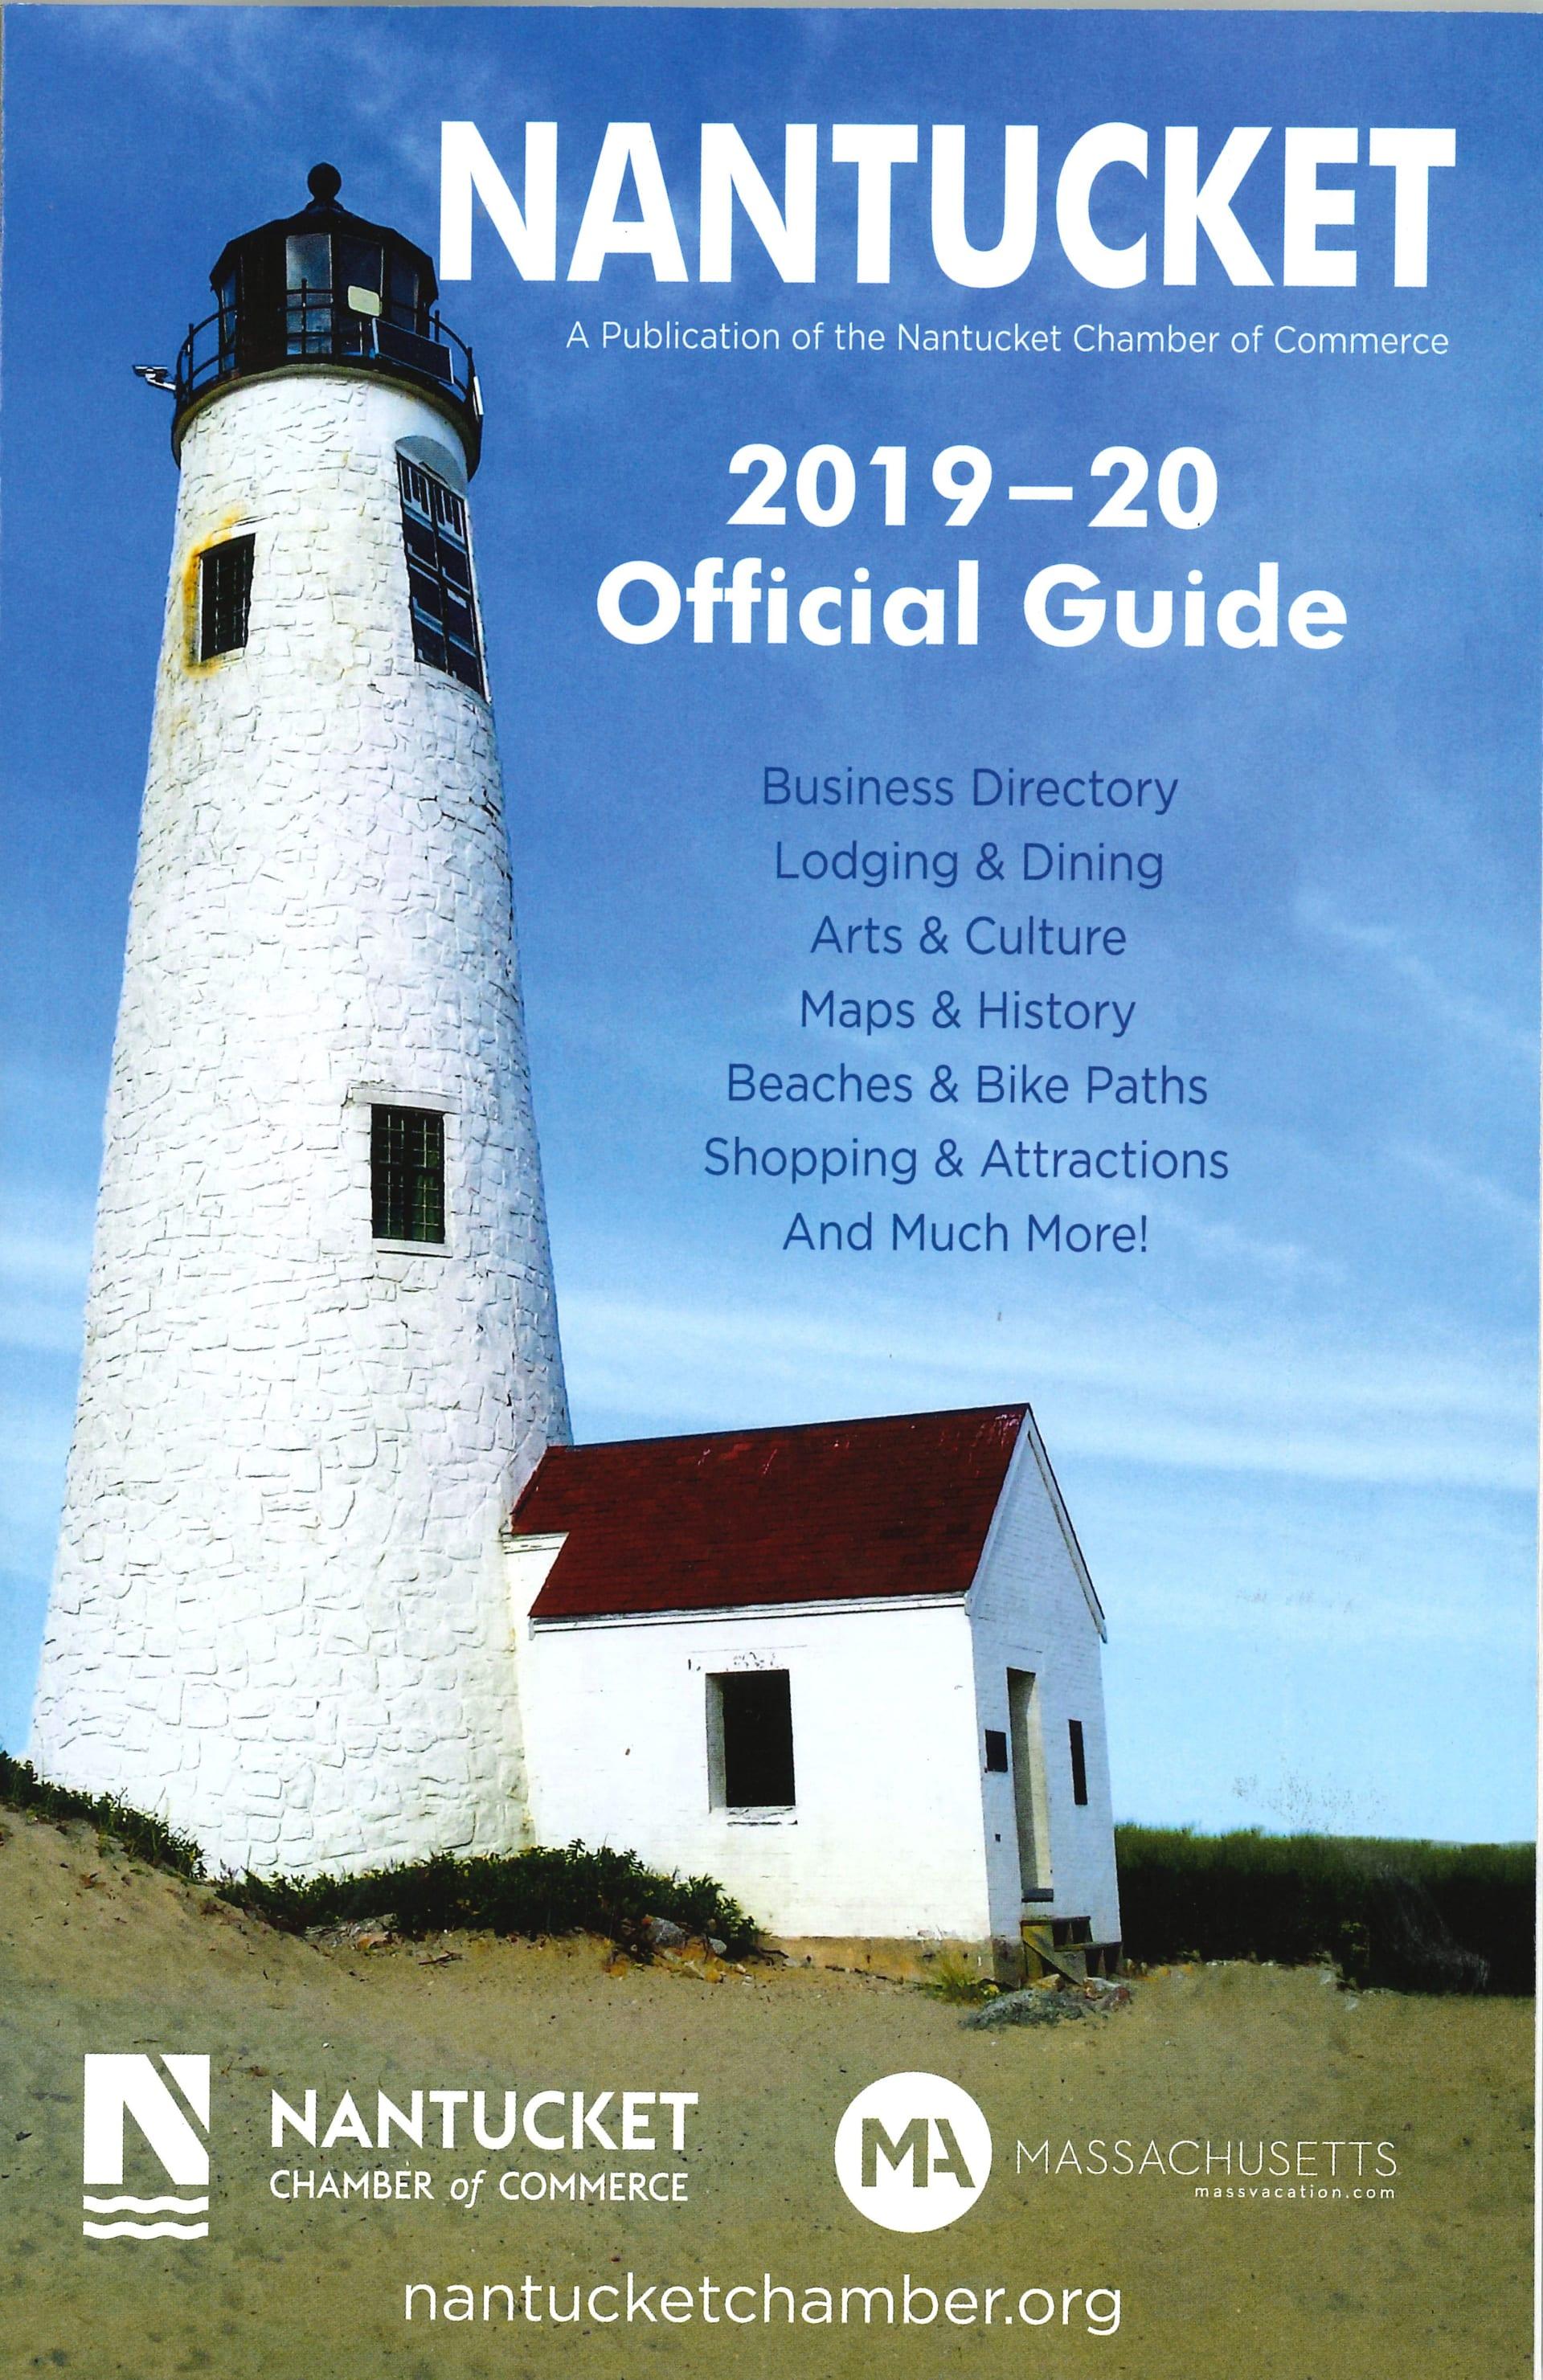 2019-20 Nantucket Guidebook